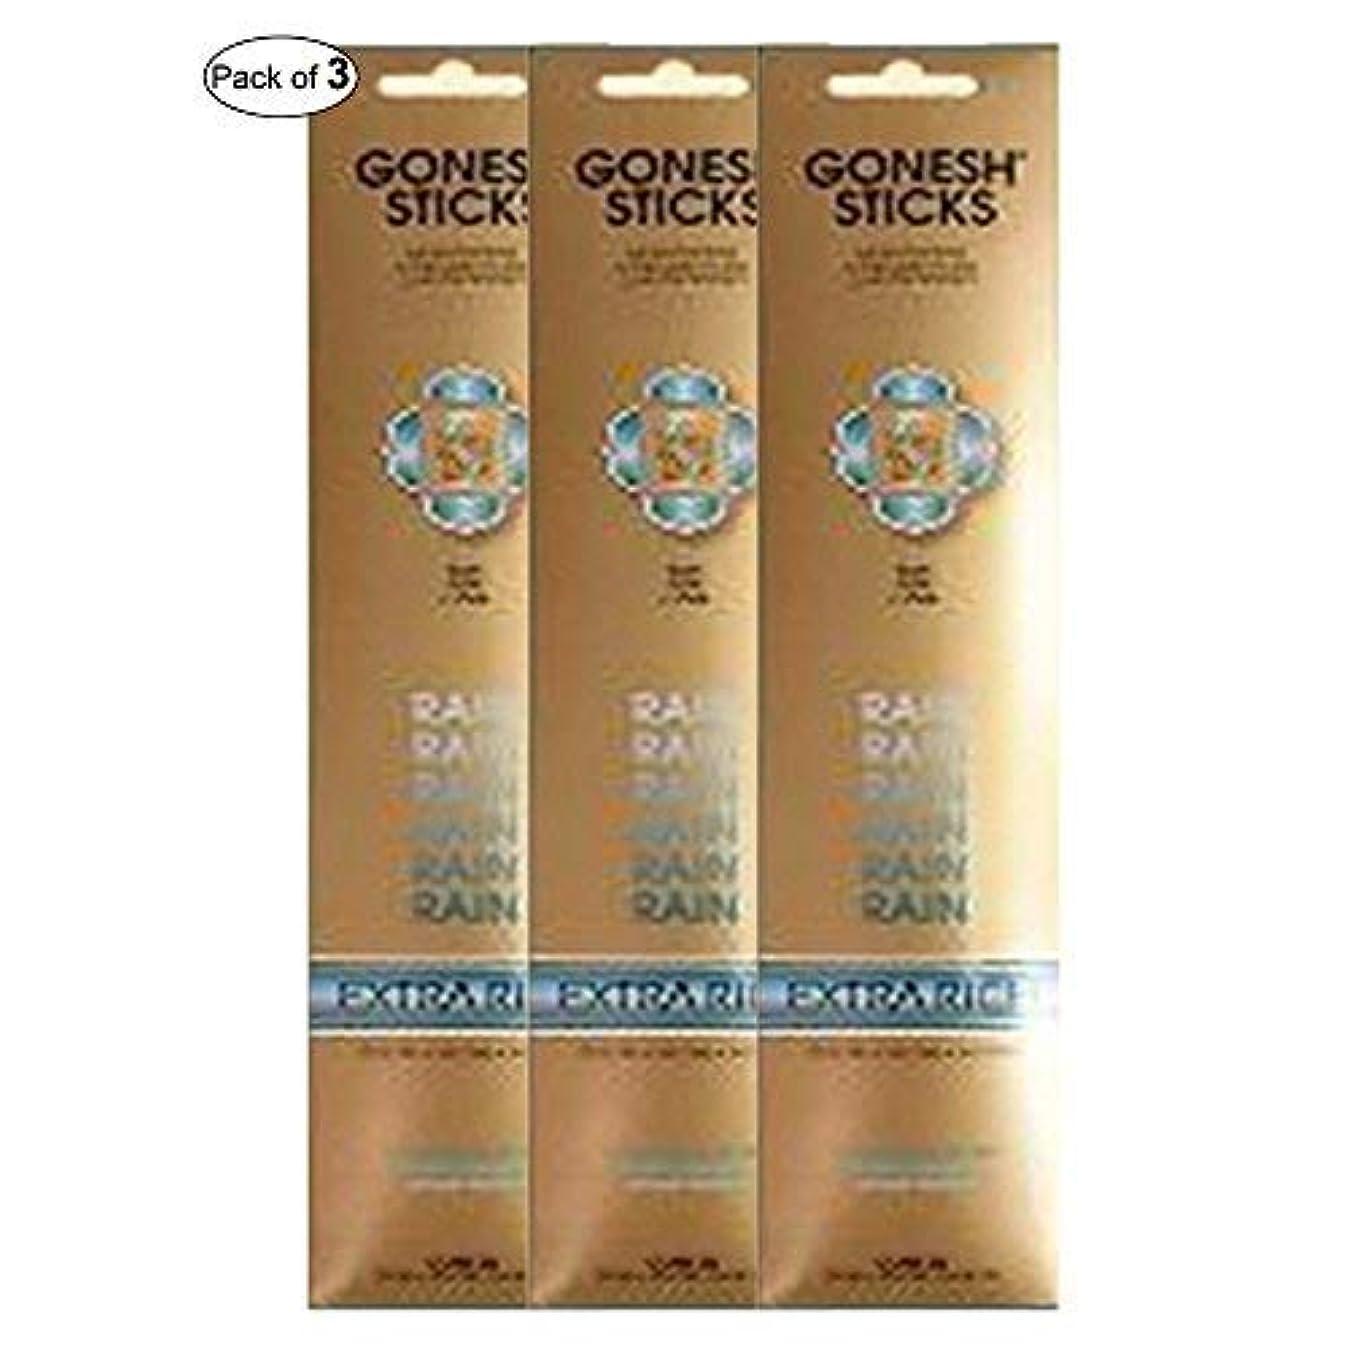 Gonesh Incense Extra rich-雨( 20 Sticks in 1パック) (パックof 3 )